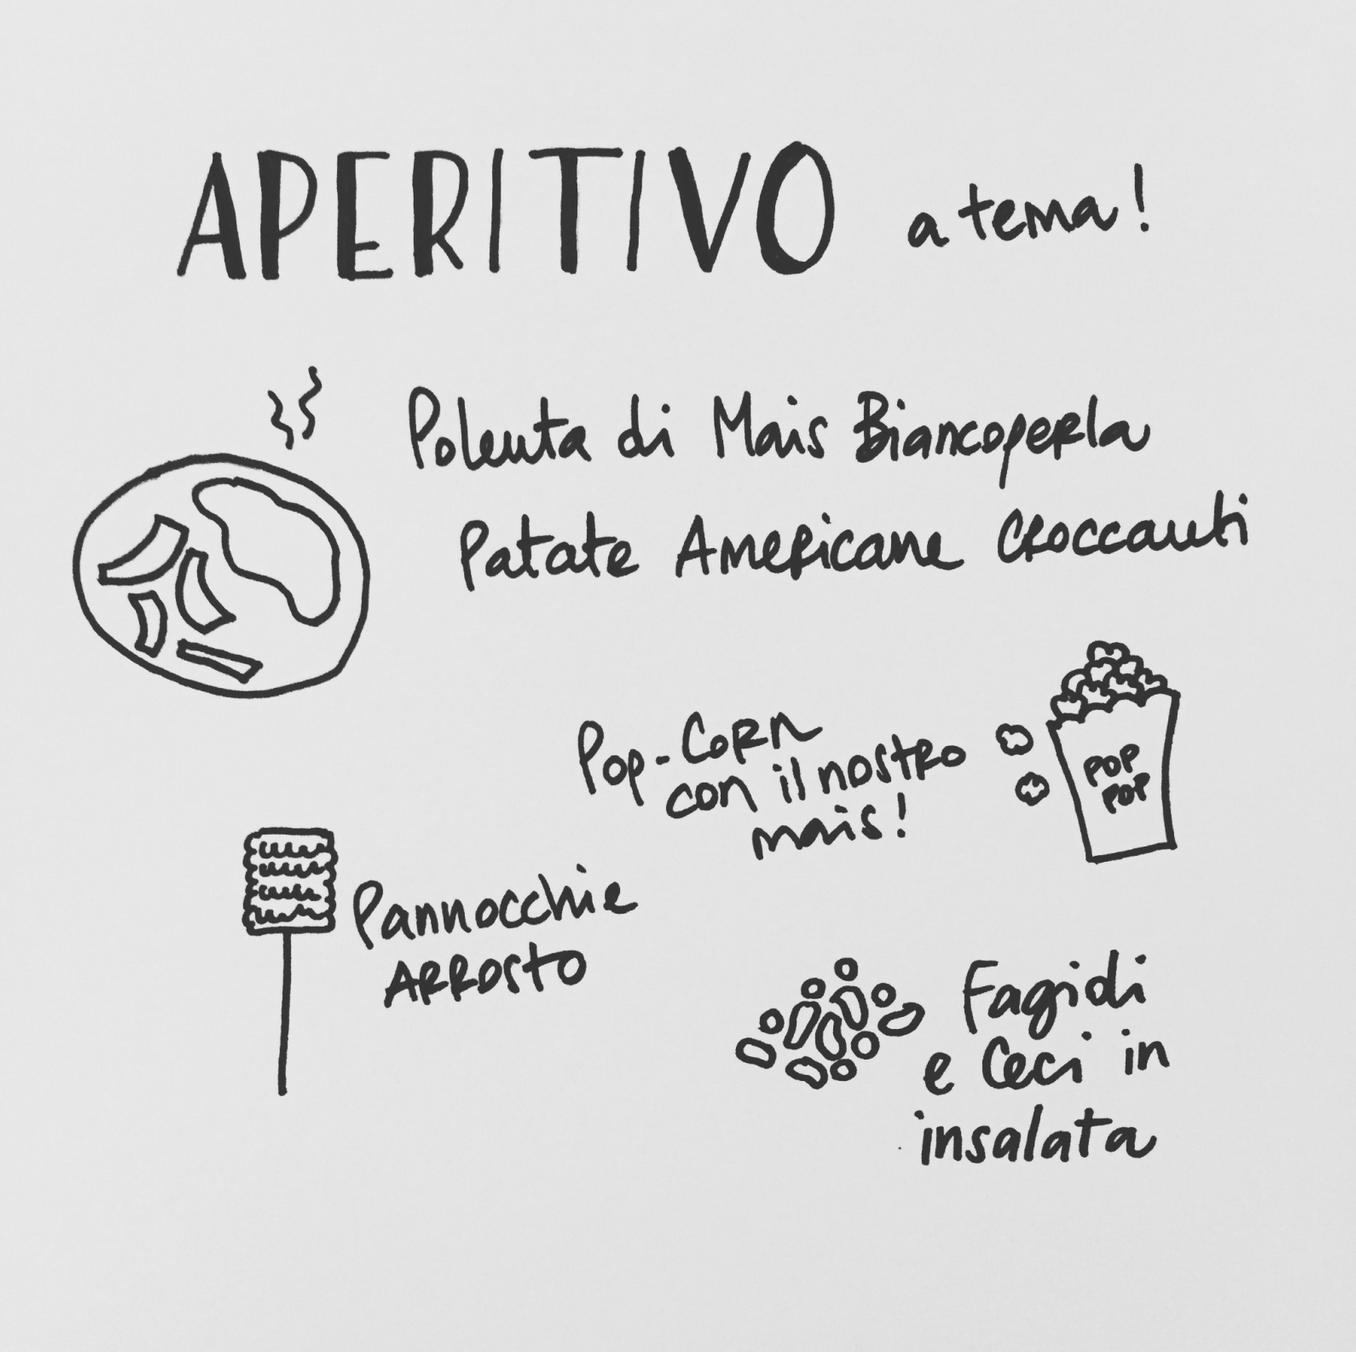 aperitivo_cadememi_agriturismo_veneto.png